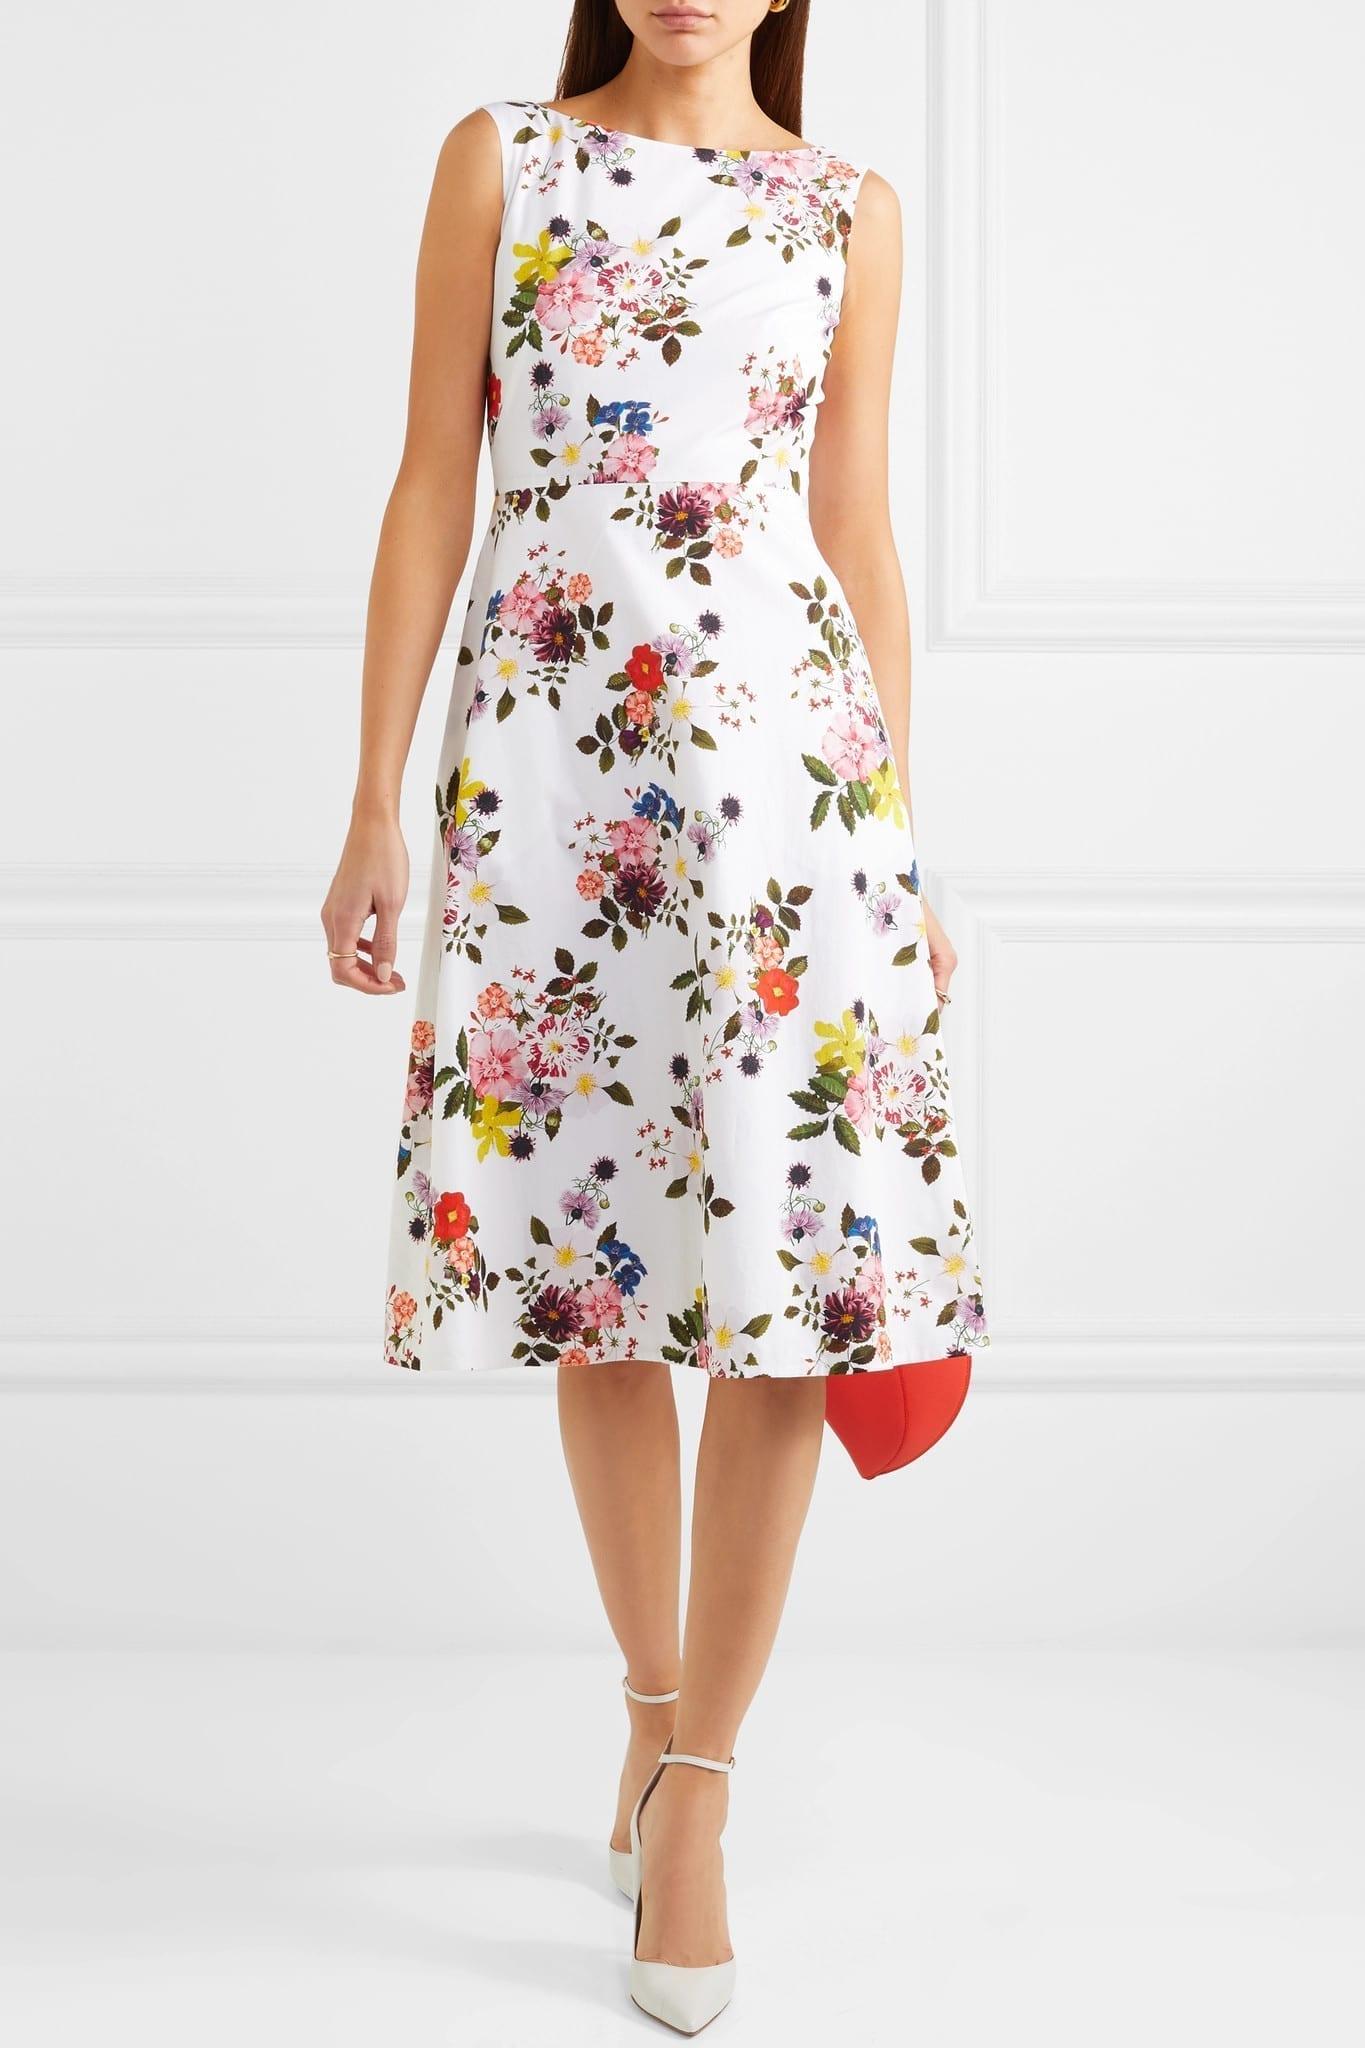 ERDEM Maia Floral-Print Cotton-Poplin White Dress